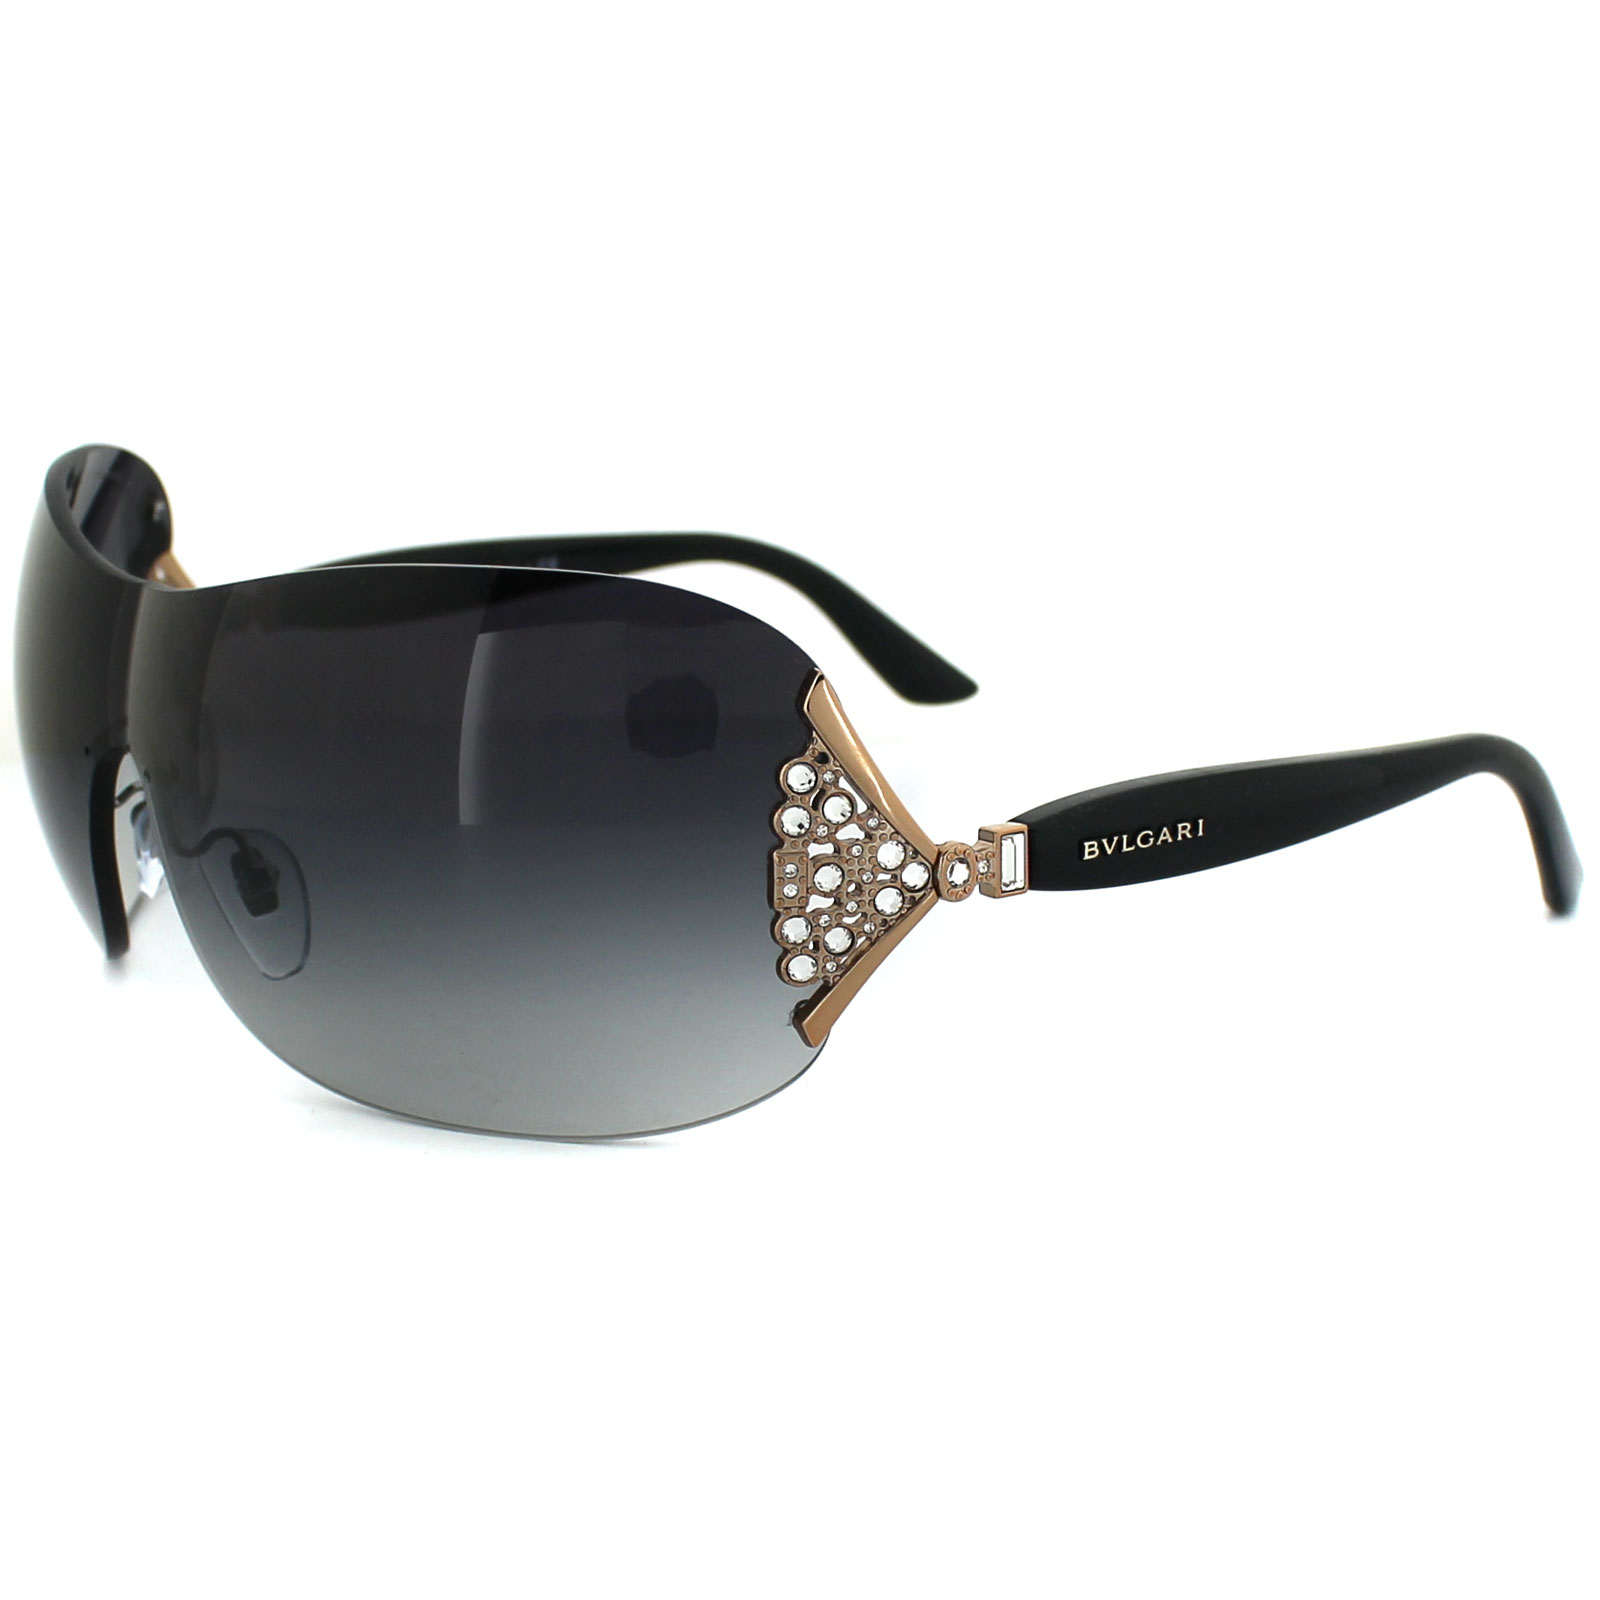 Bvlgari Sunglasses Gold Frame : Bvlgari Sunglasses 6061B 376/8G Gold & Black Grey Gradient ...